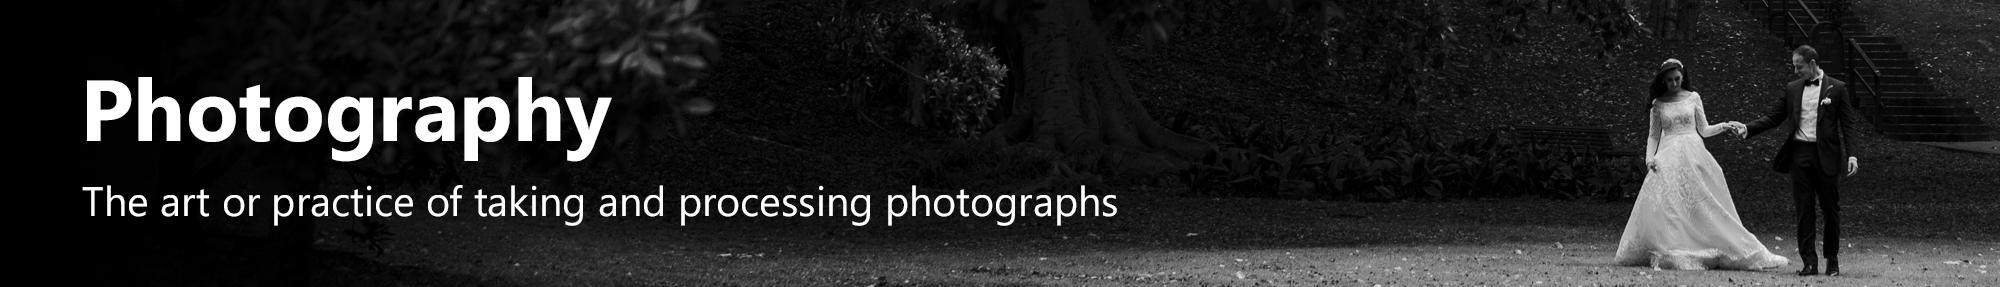 SERVICES HEADER PHOTOGRAPHY.jpg